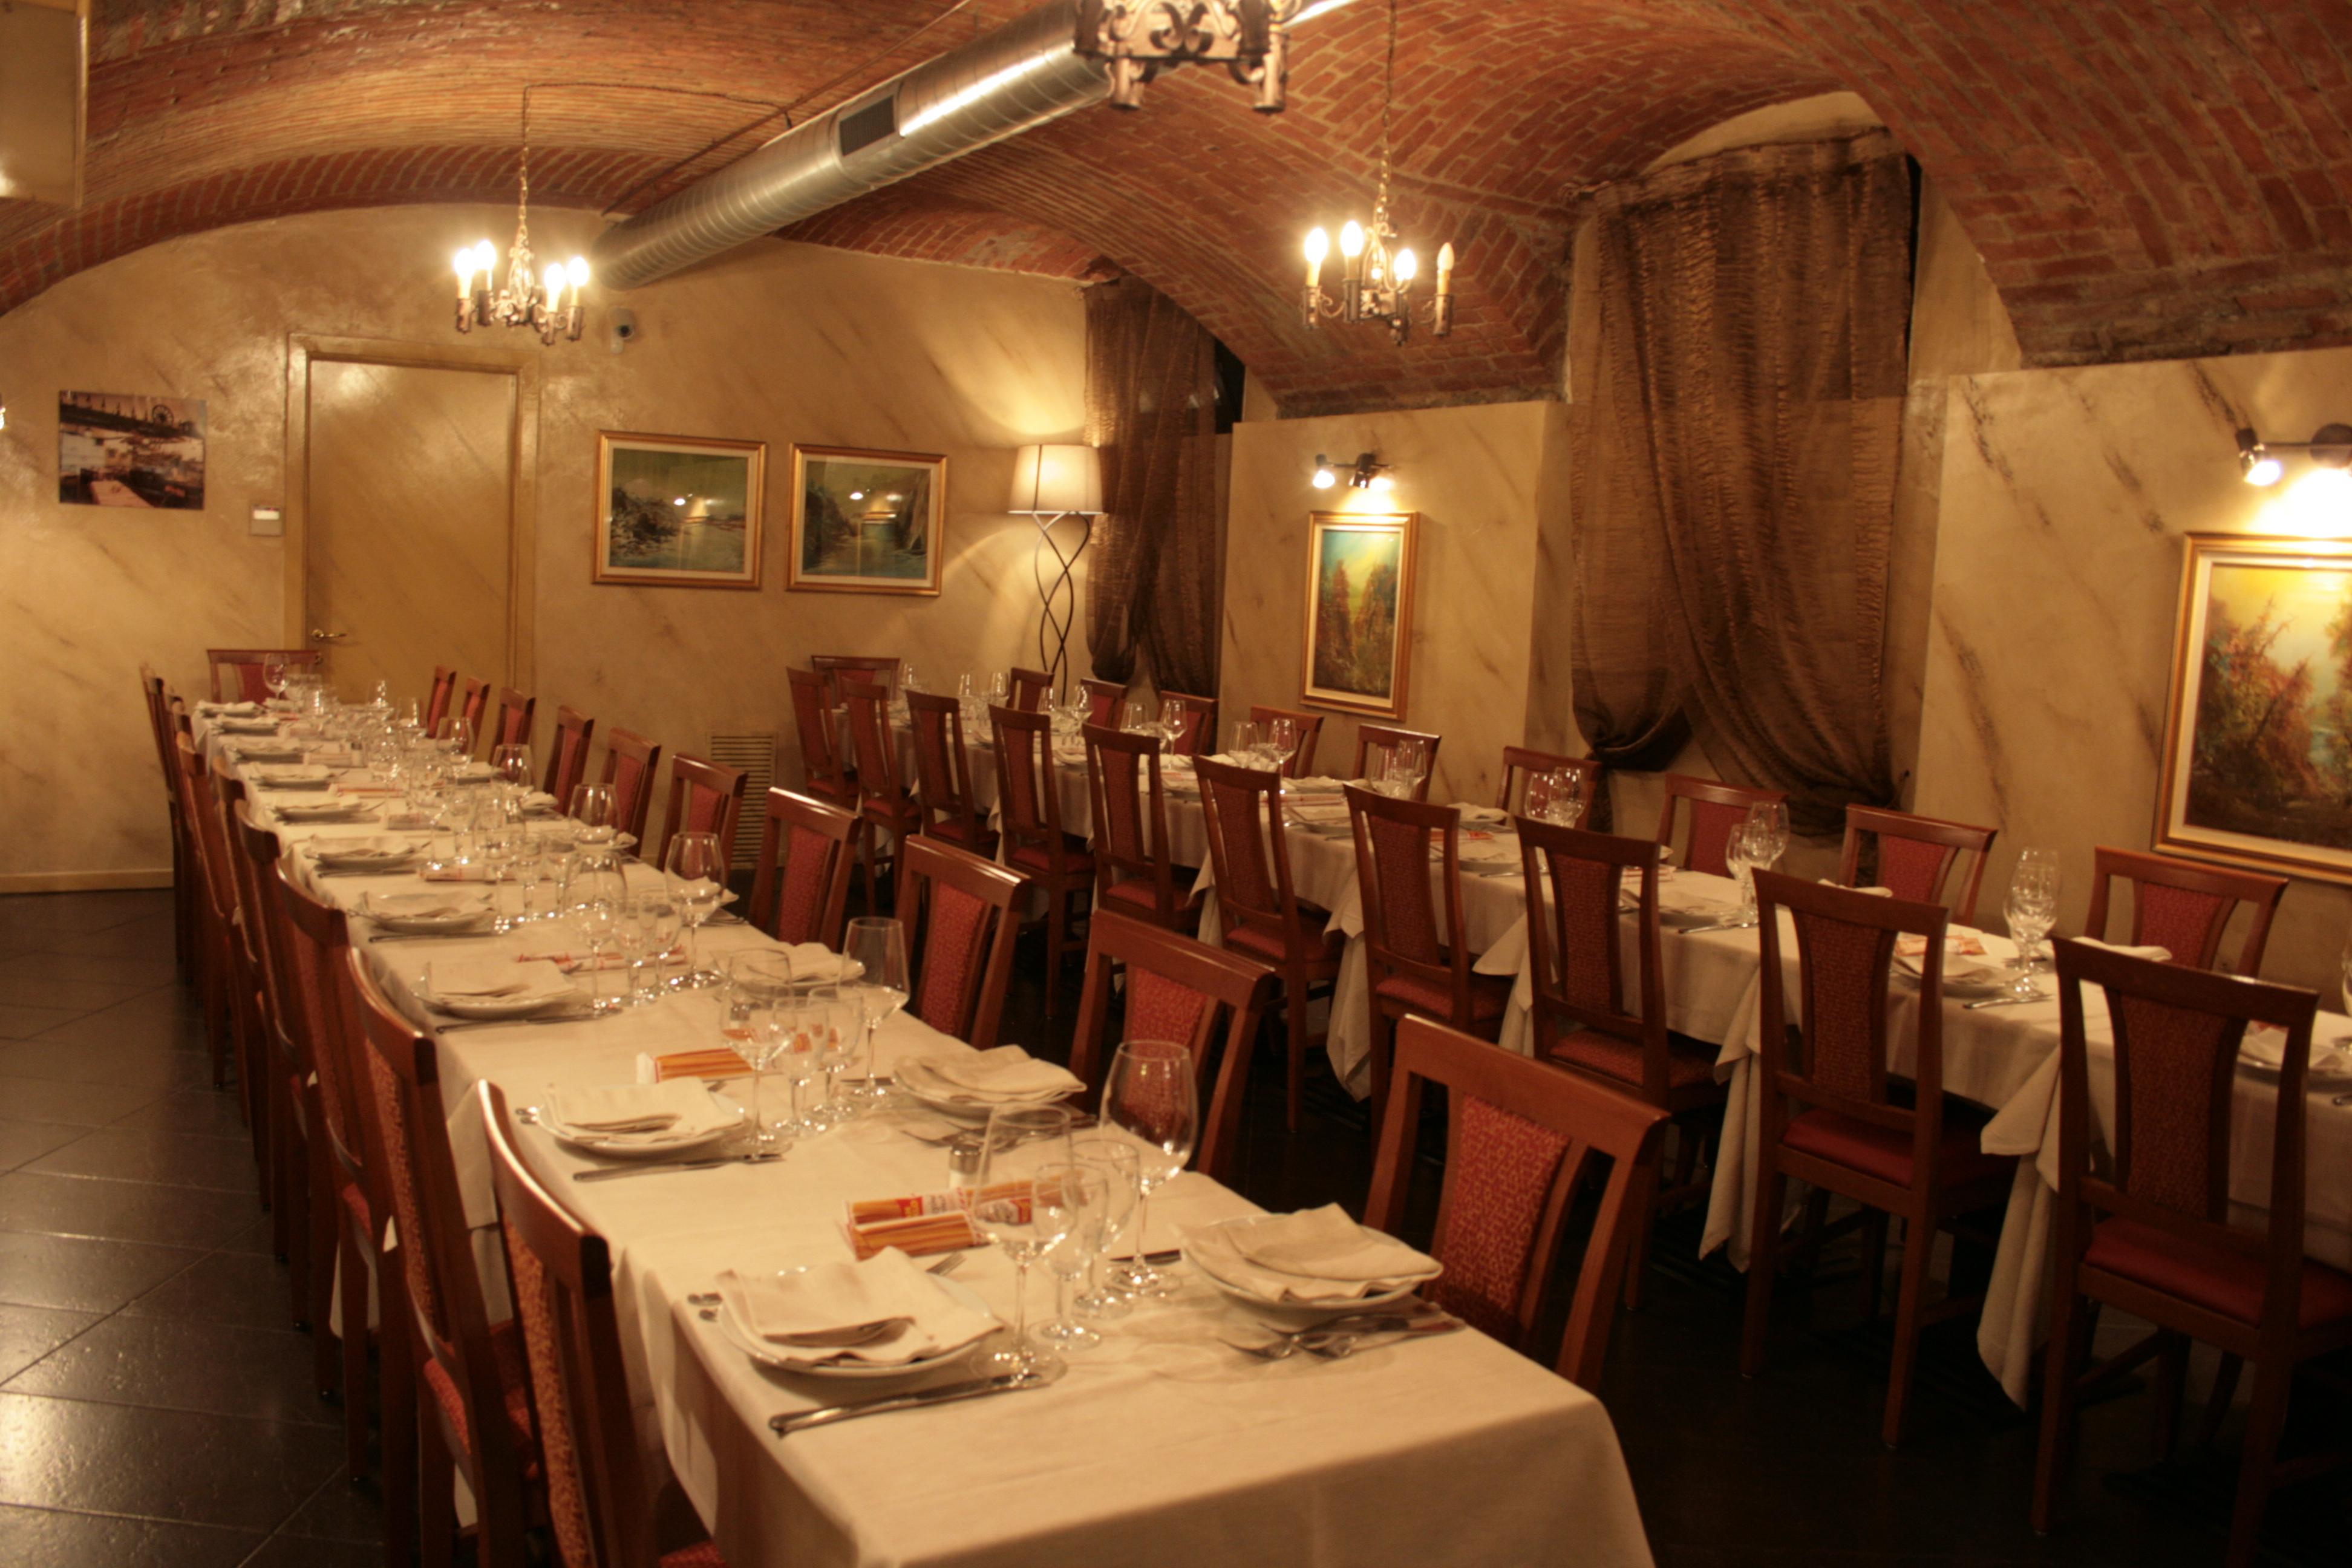 Pranzo A Buffet Milano : Momart cafè foto e recensioni all you can eat viale